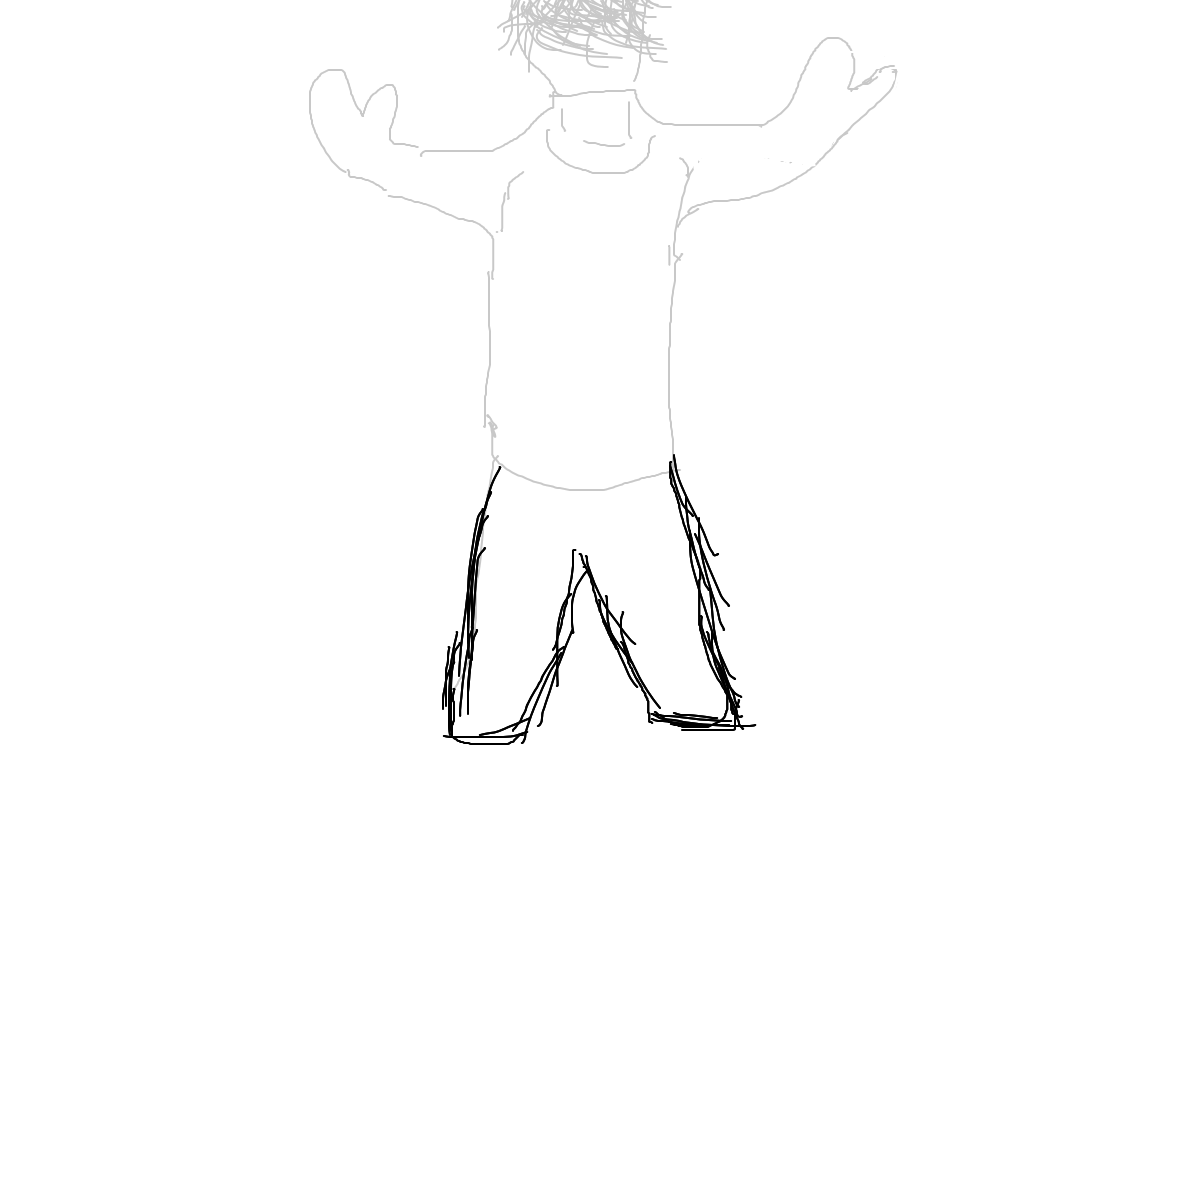 BAAAM drawing#5269 lat:39.9655799865722660lng: -75.1809158325195300